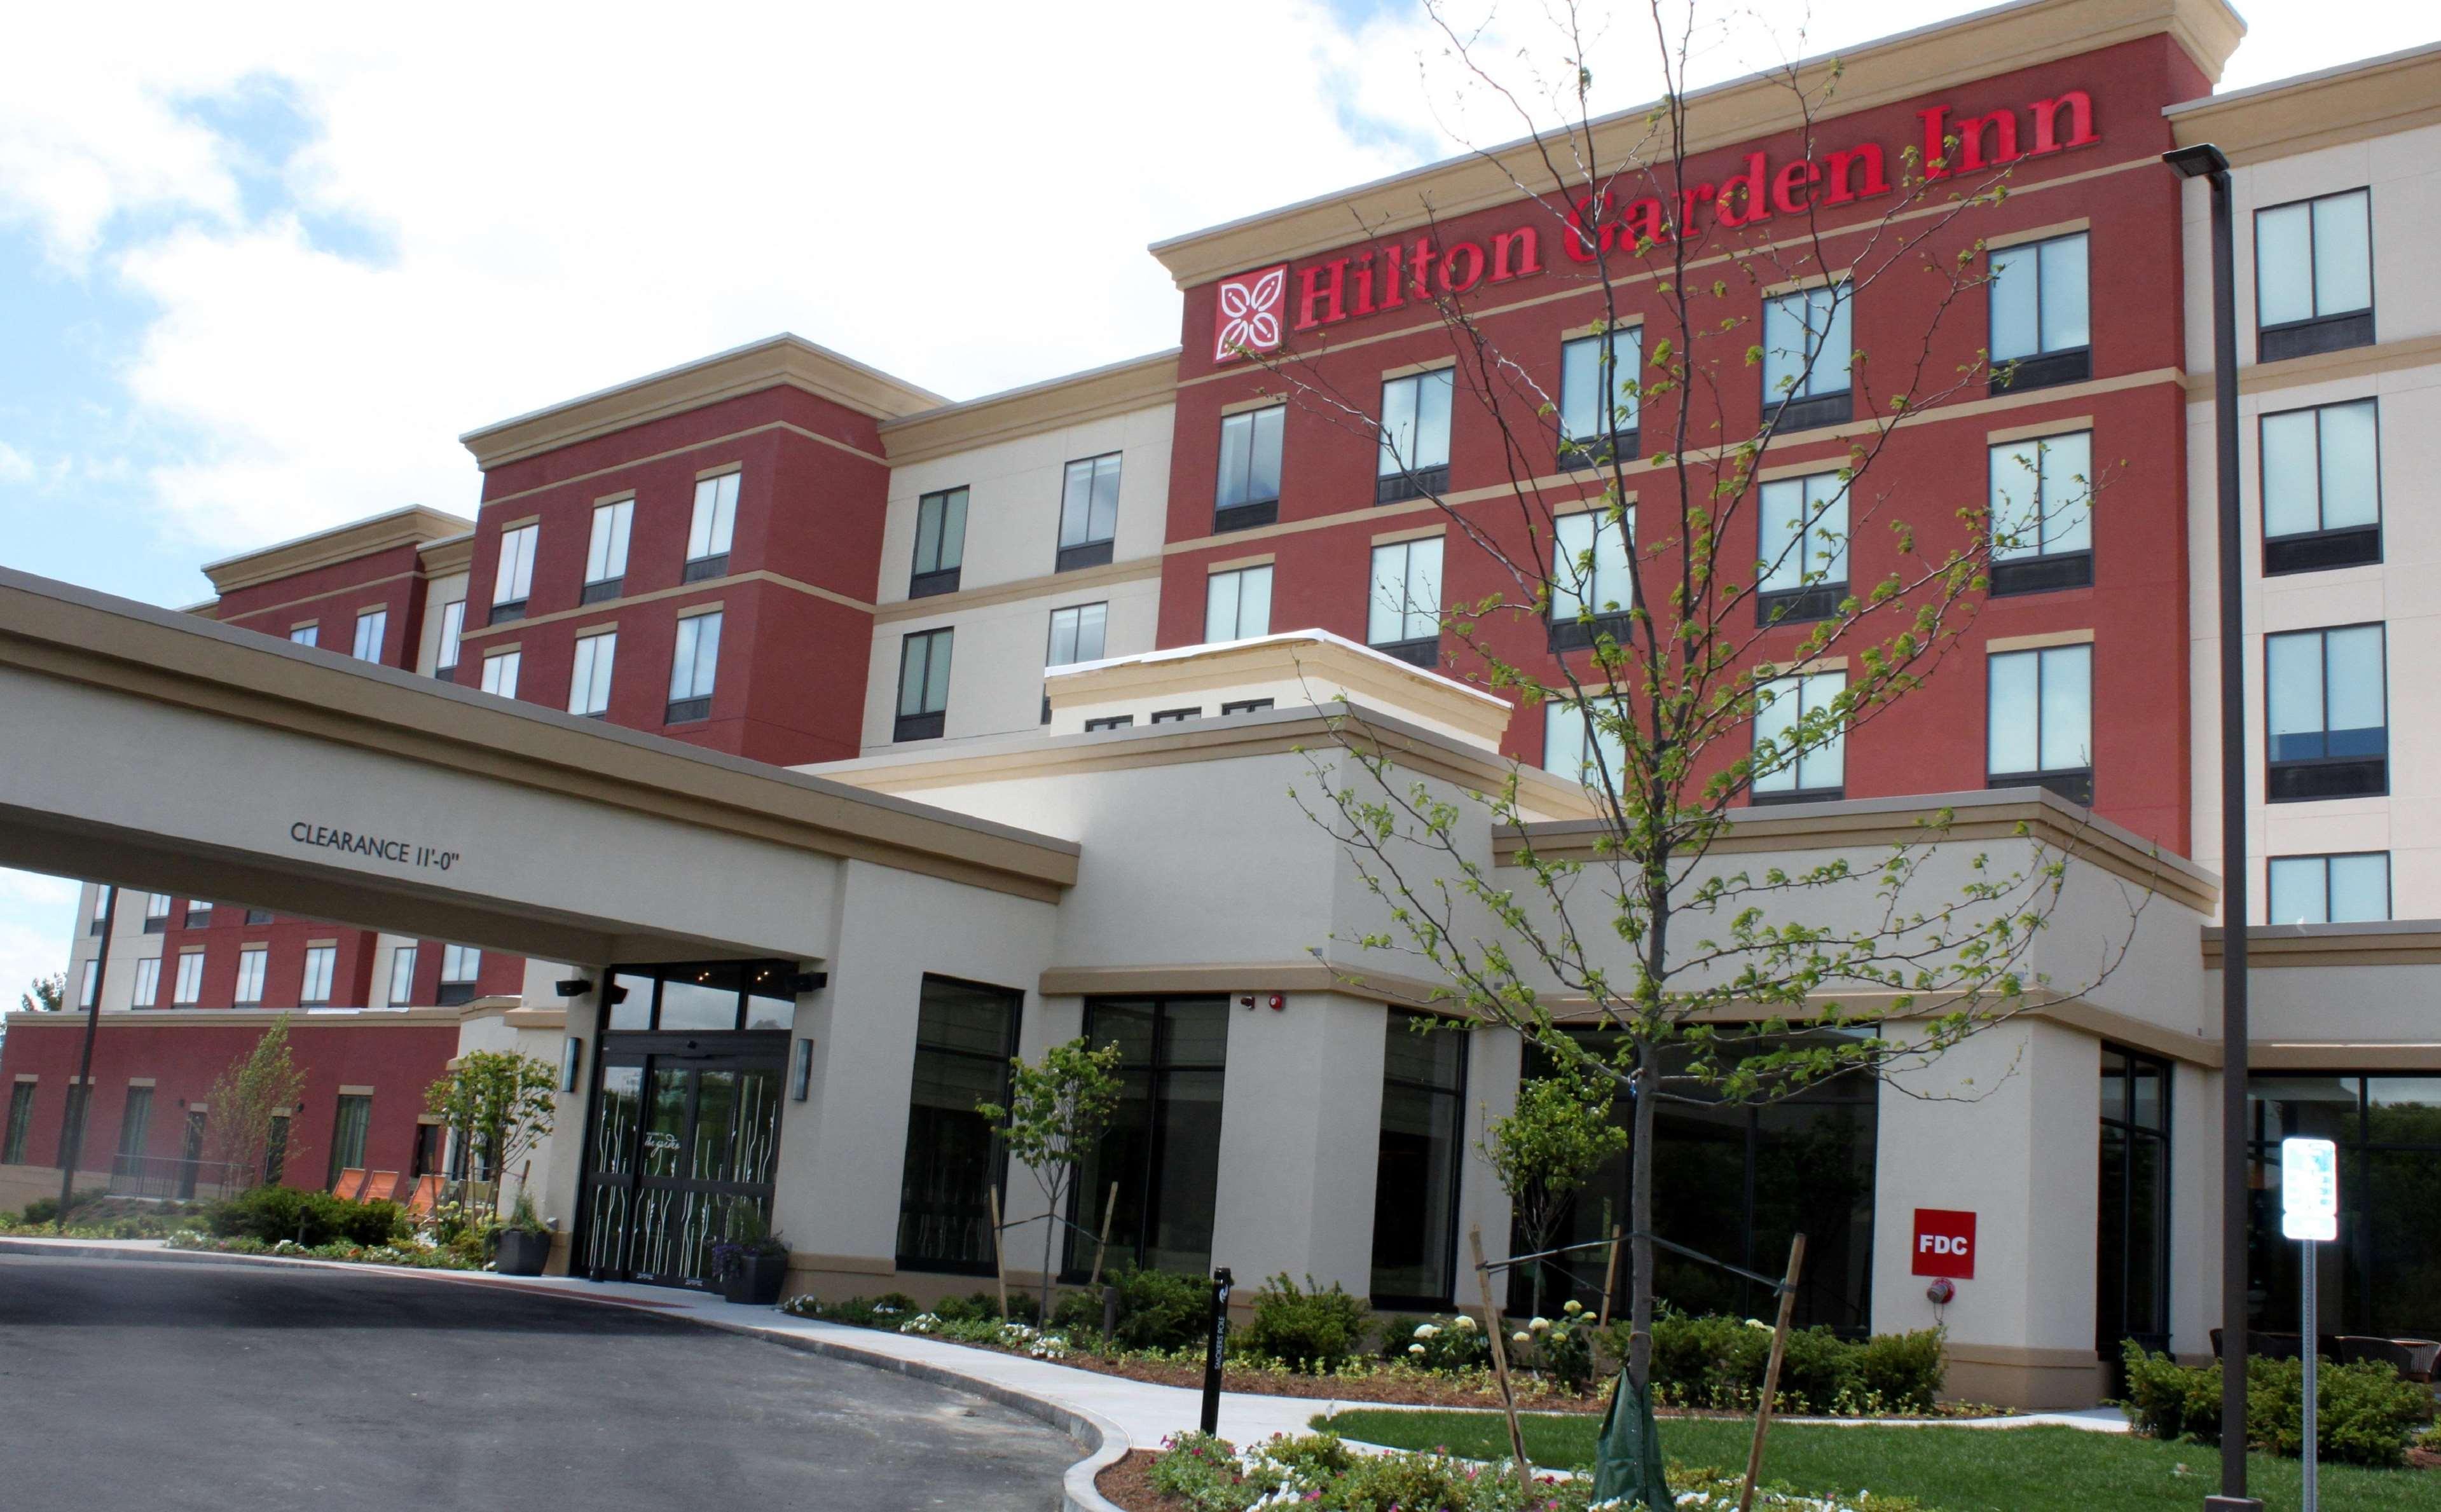 Hilton Garden Inn Boston/Marlborough image 36